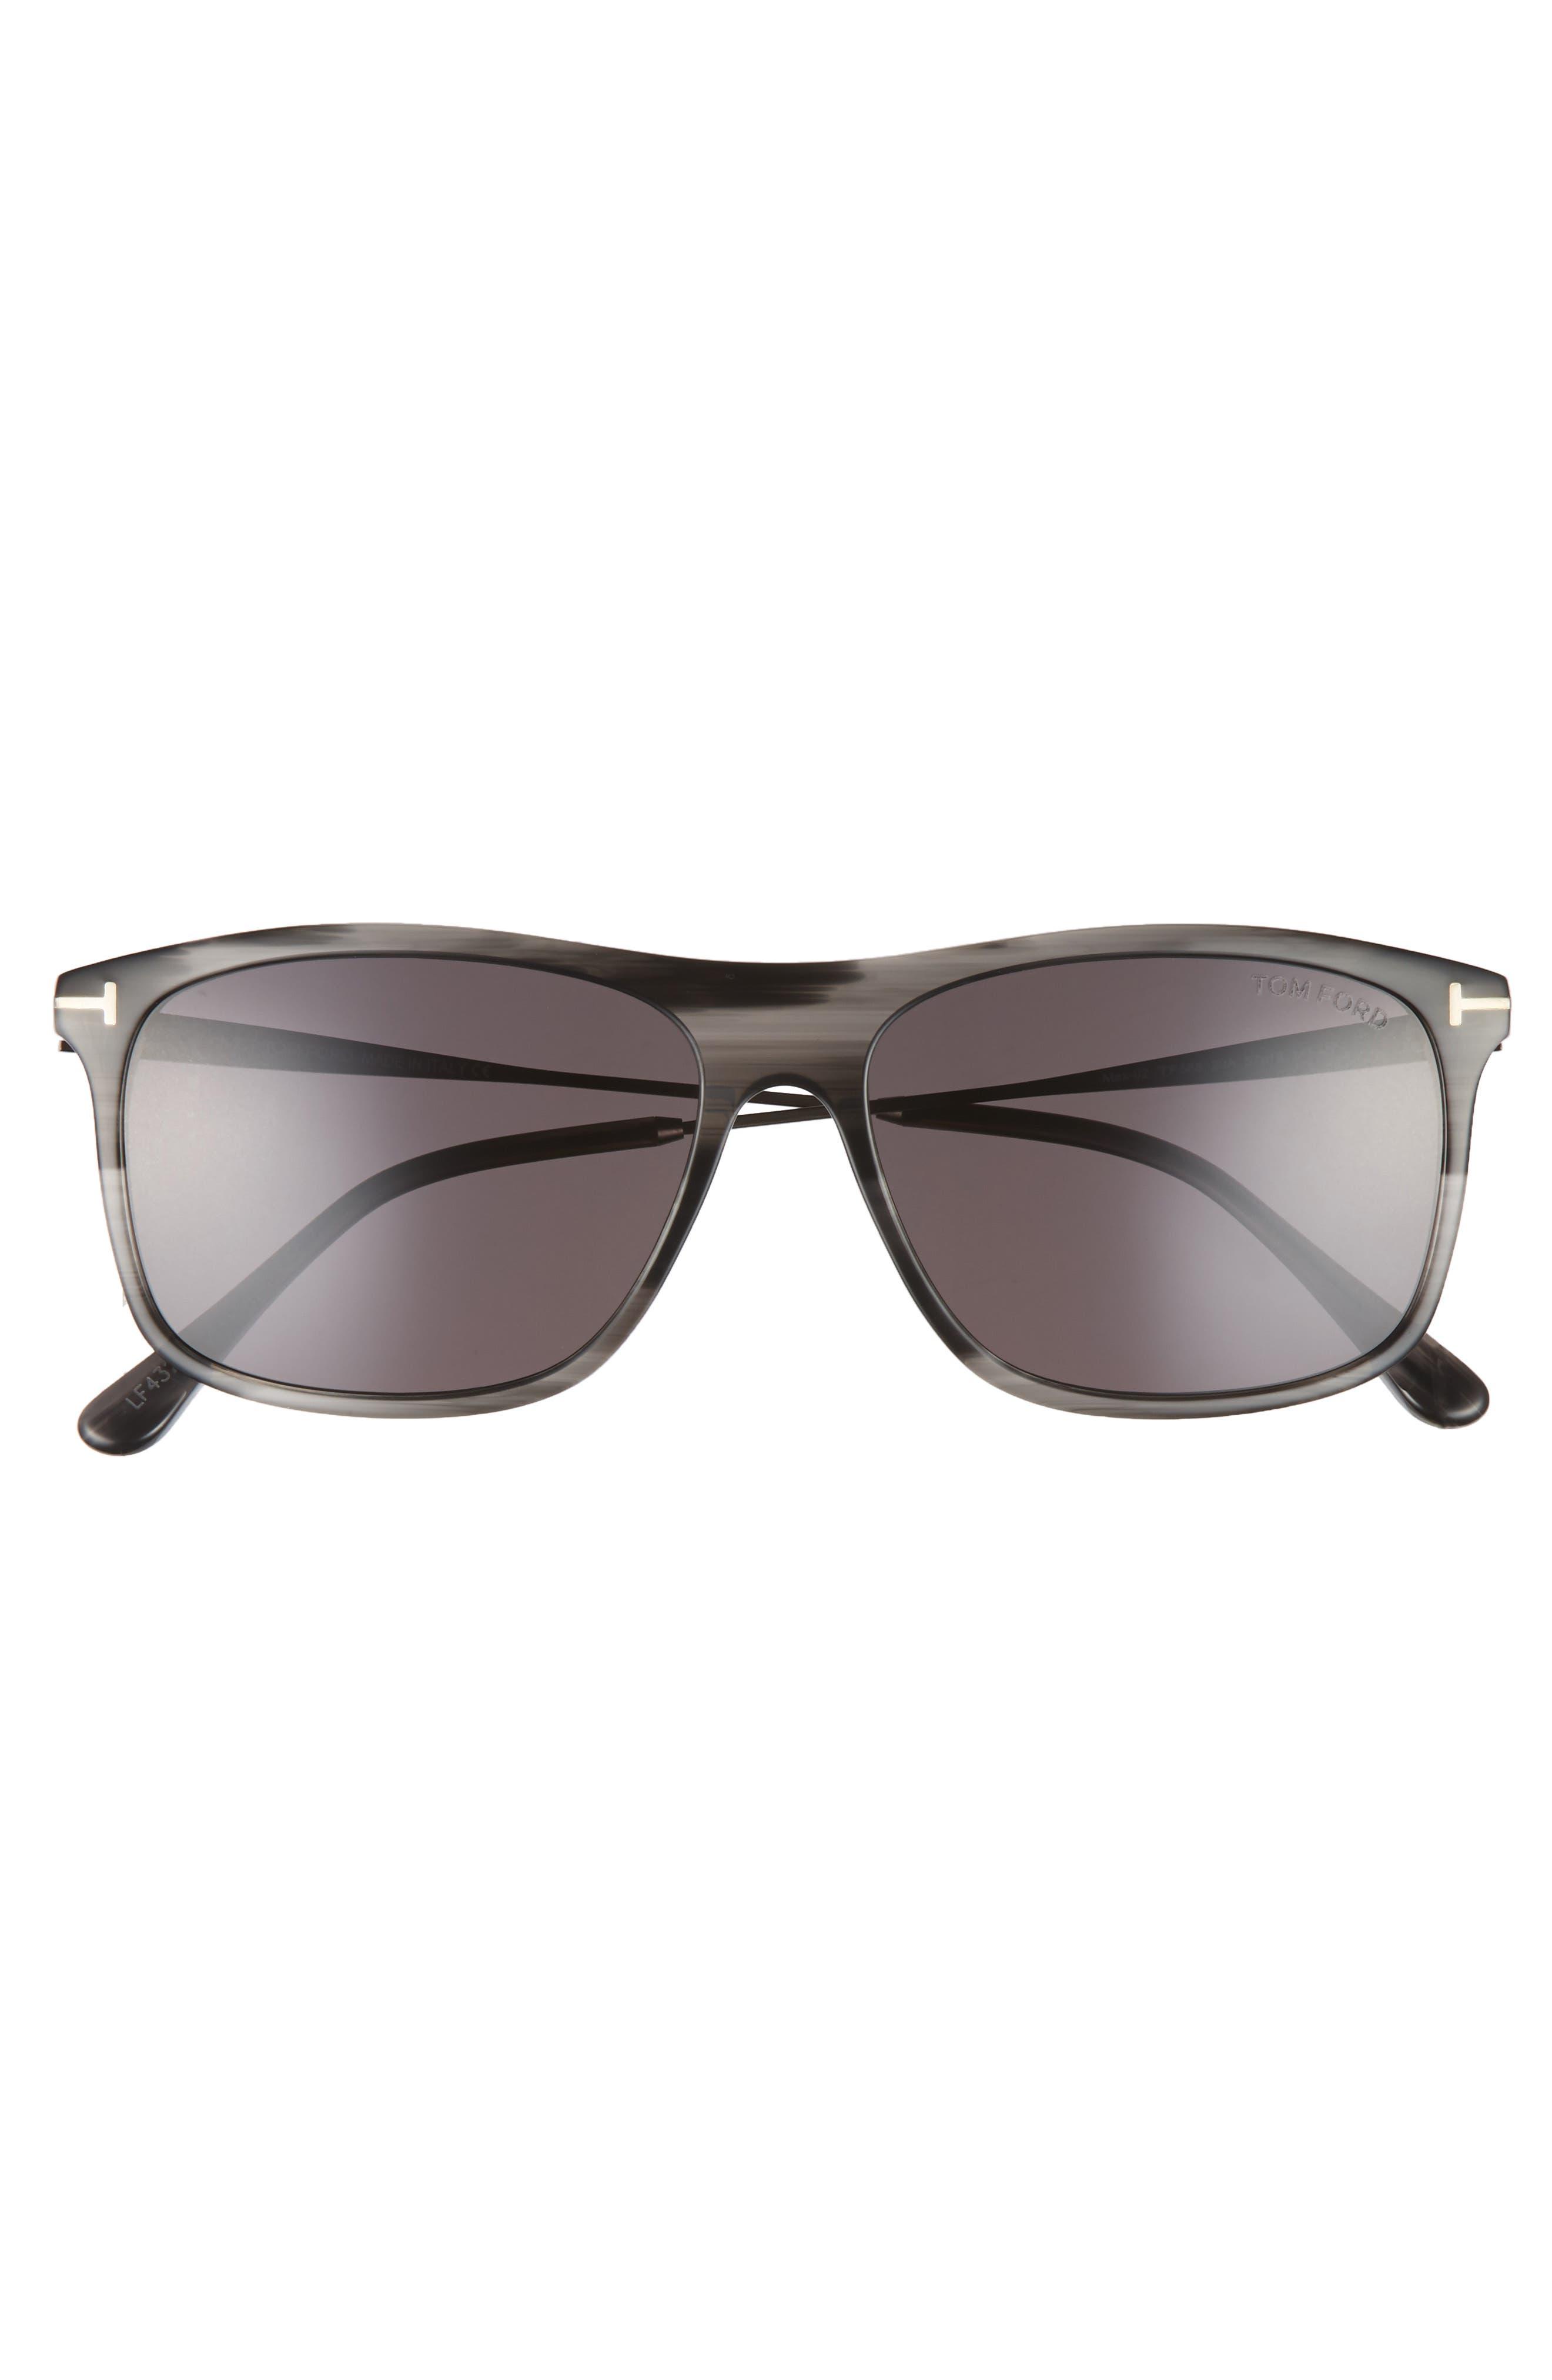 Max 57mm Sunglasses,                             Alternate thumbnail 2, color,                             GREY/ BLACK/ RUTHENIUM/ SMOKE